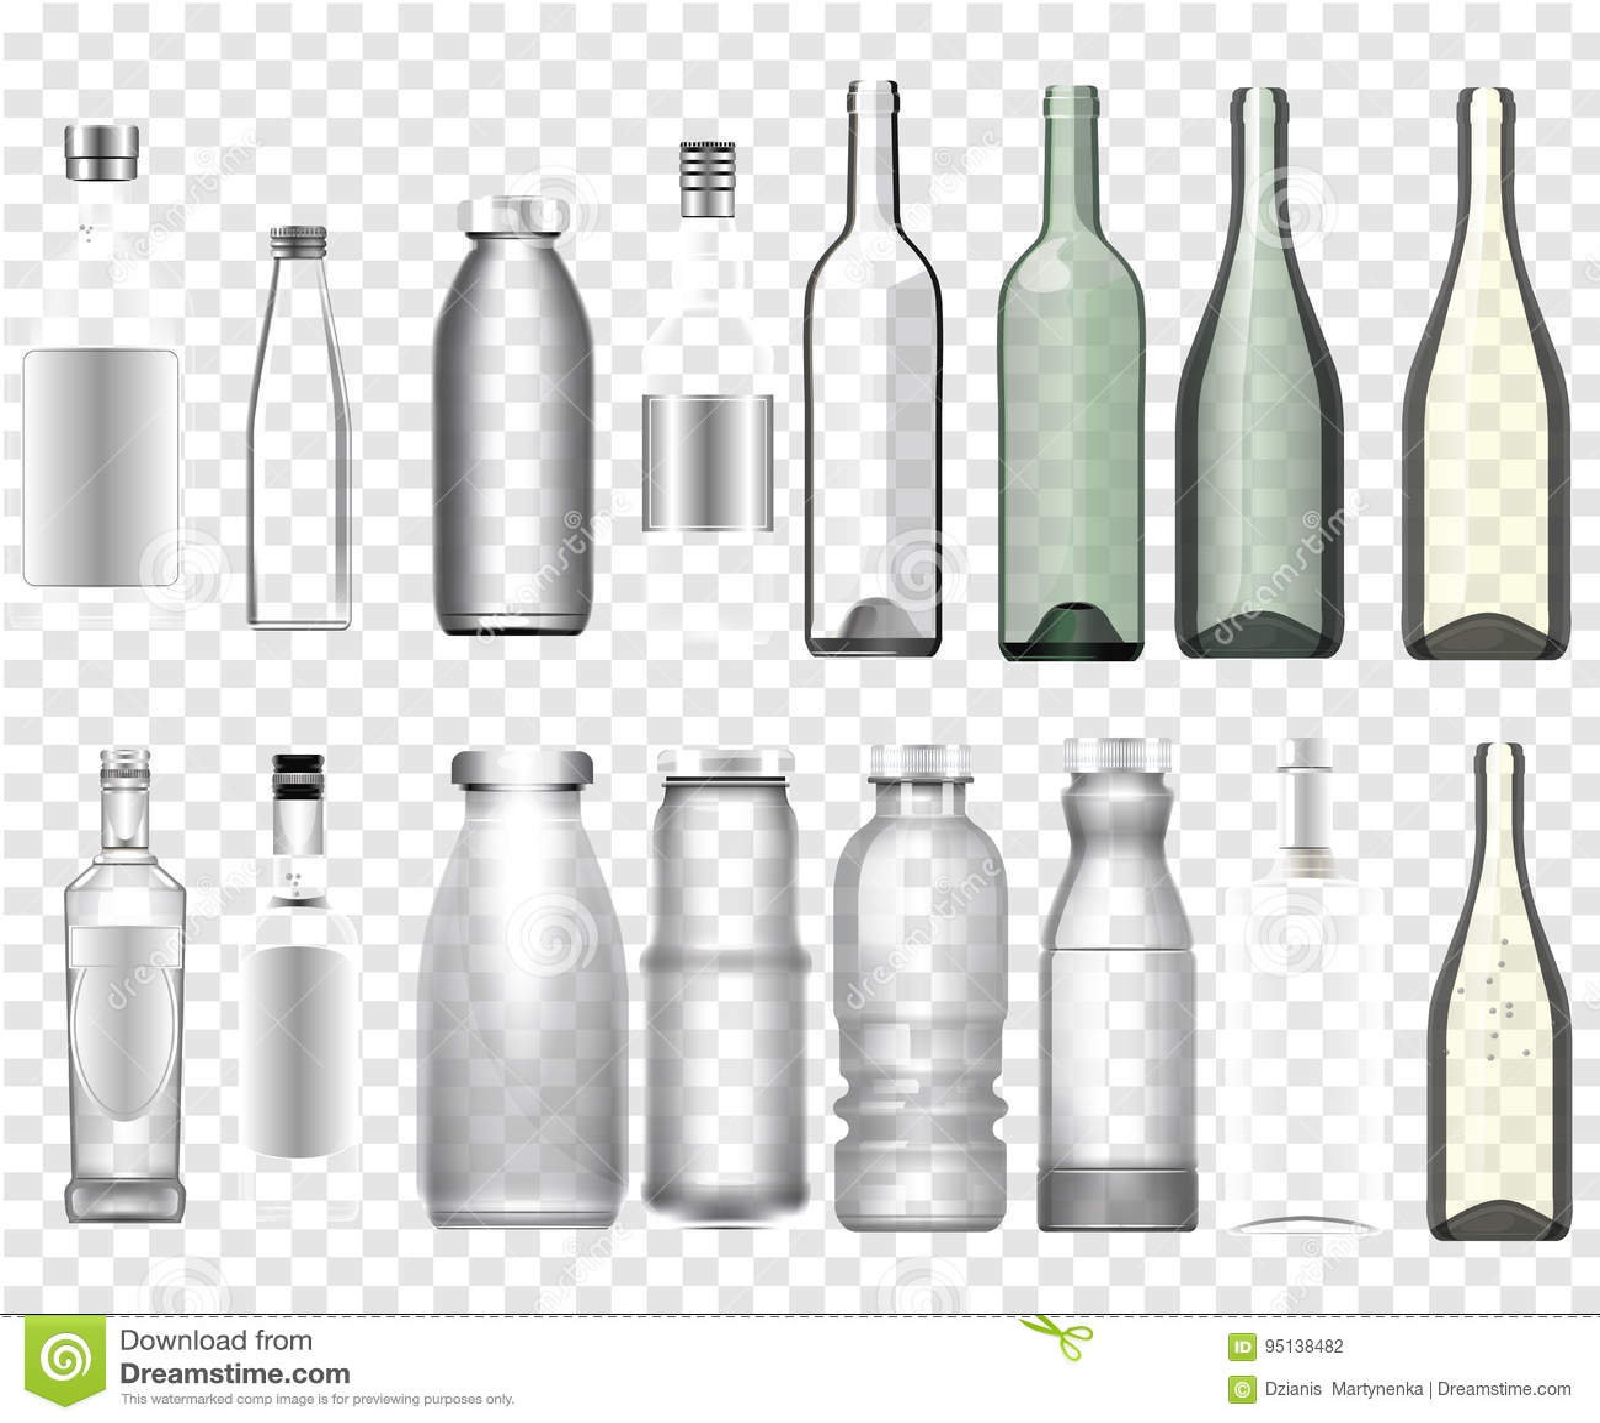 Realistic epmty bottles mockup